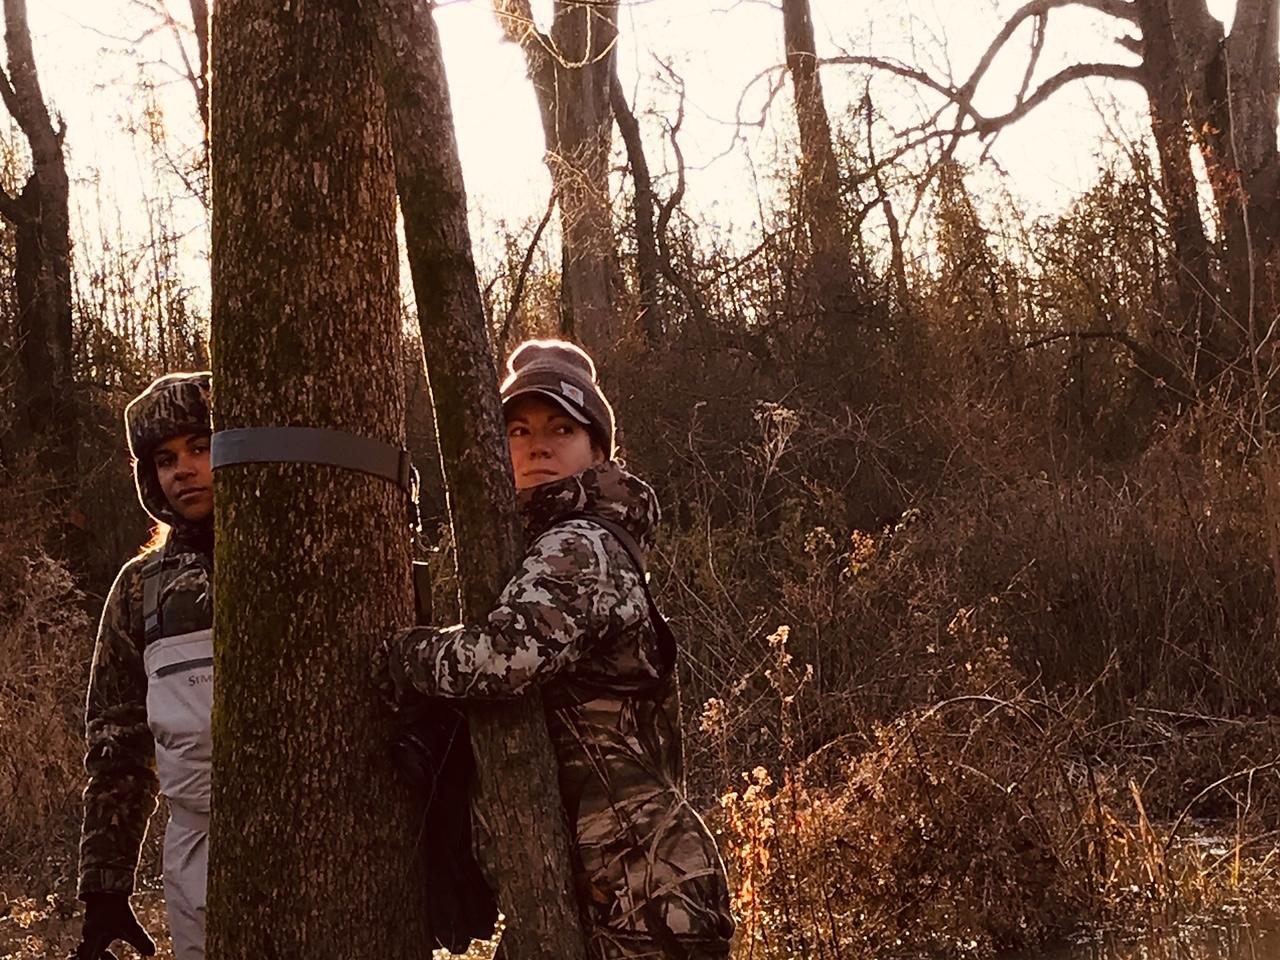 Hunting in Arkansas